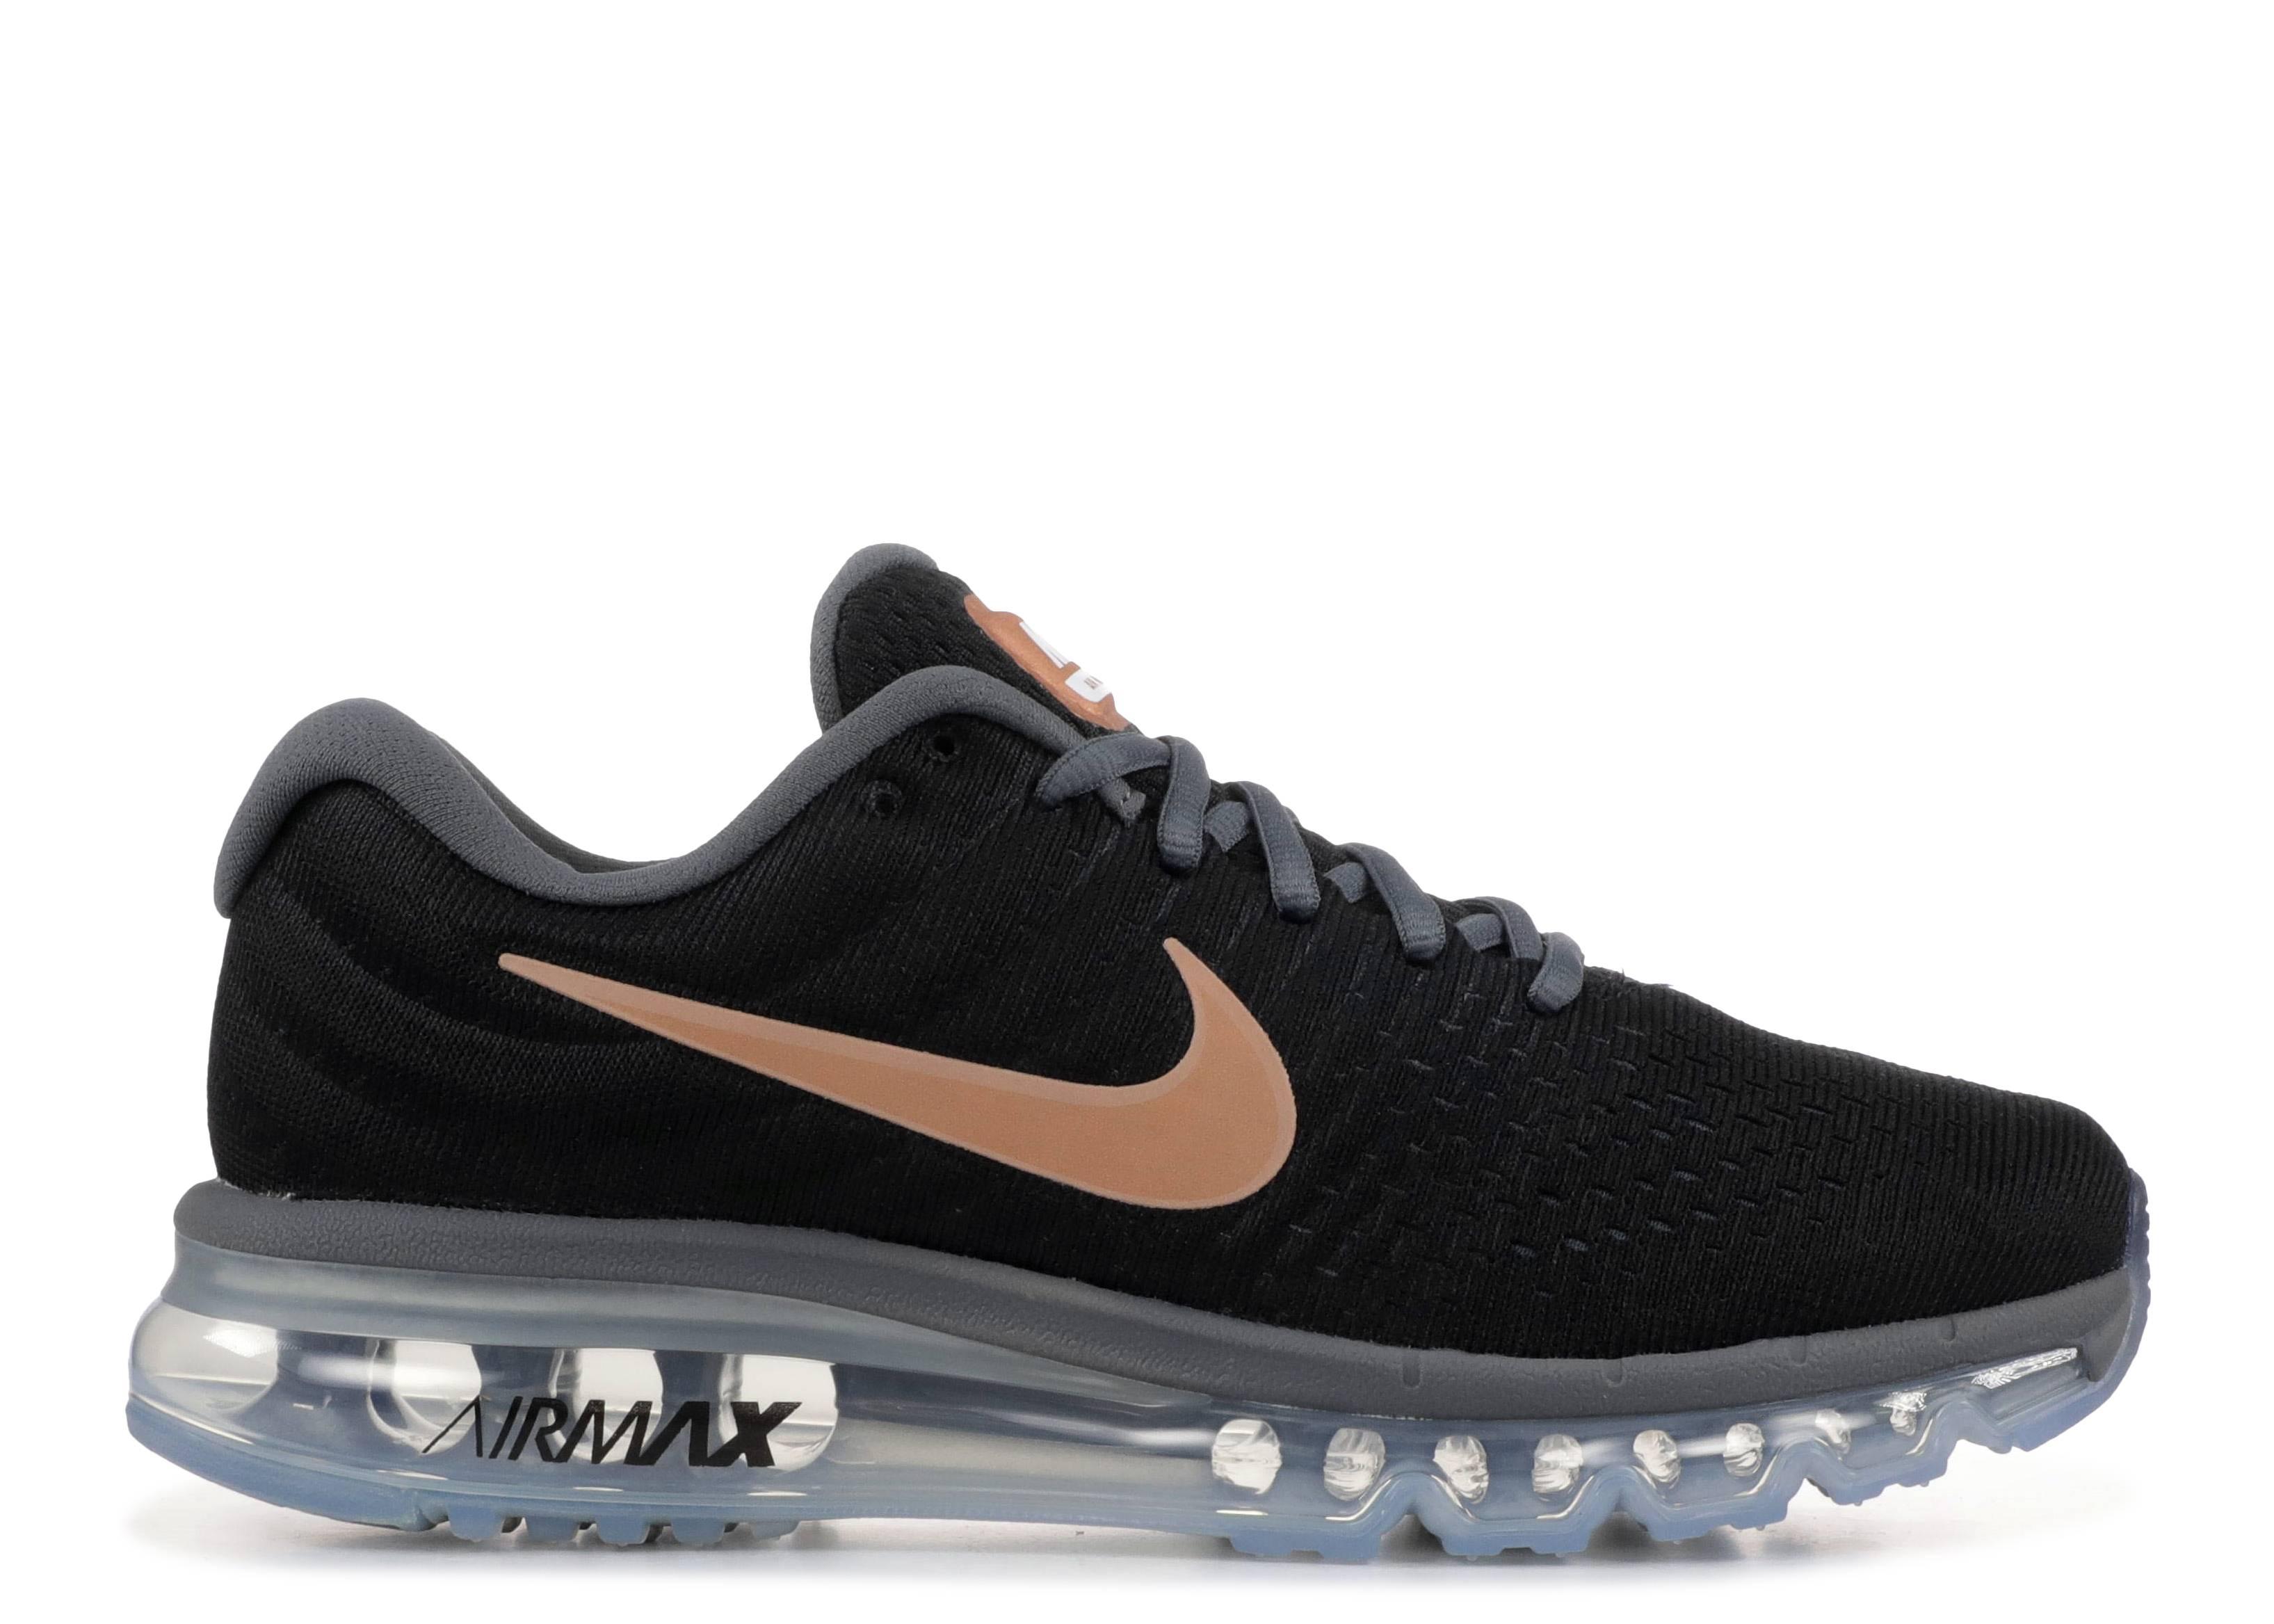 Wmns Nike Air Max 2017 Nike 849560 008 black.mtlcred bronze | Flight Club